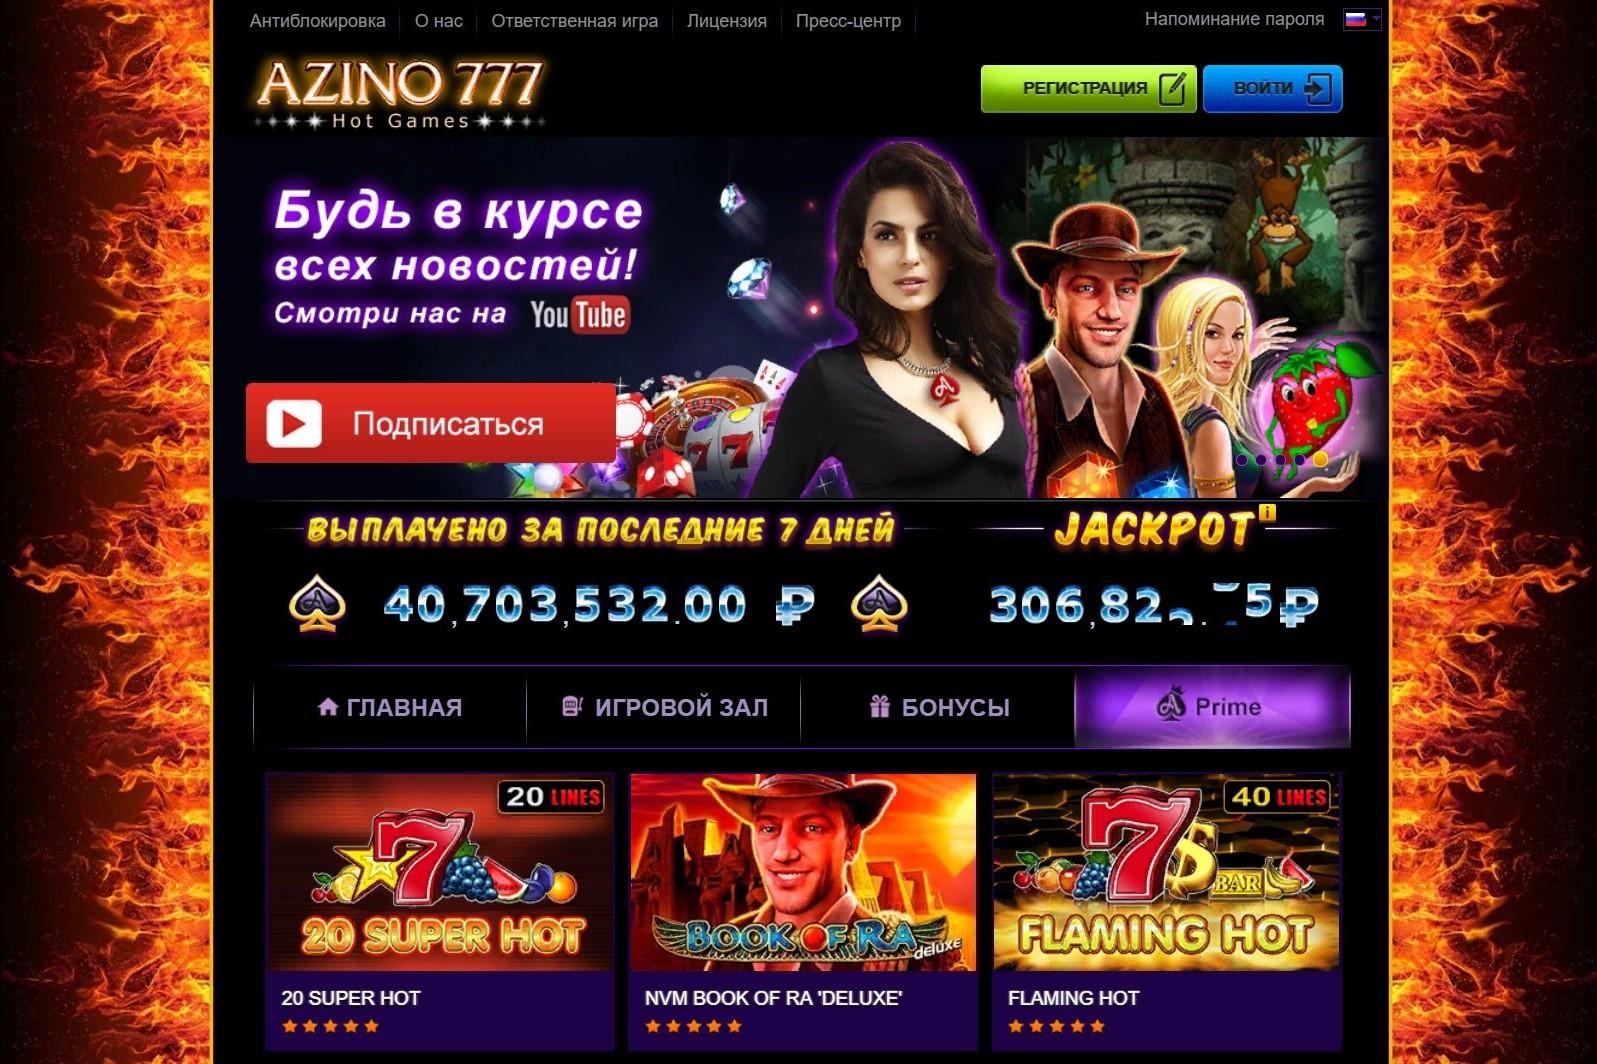 онлайн азино777 мобильная версия